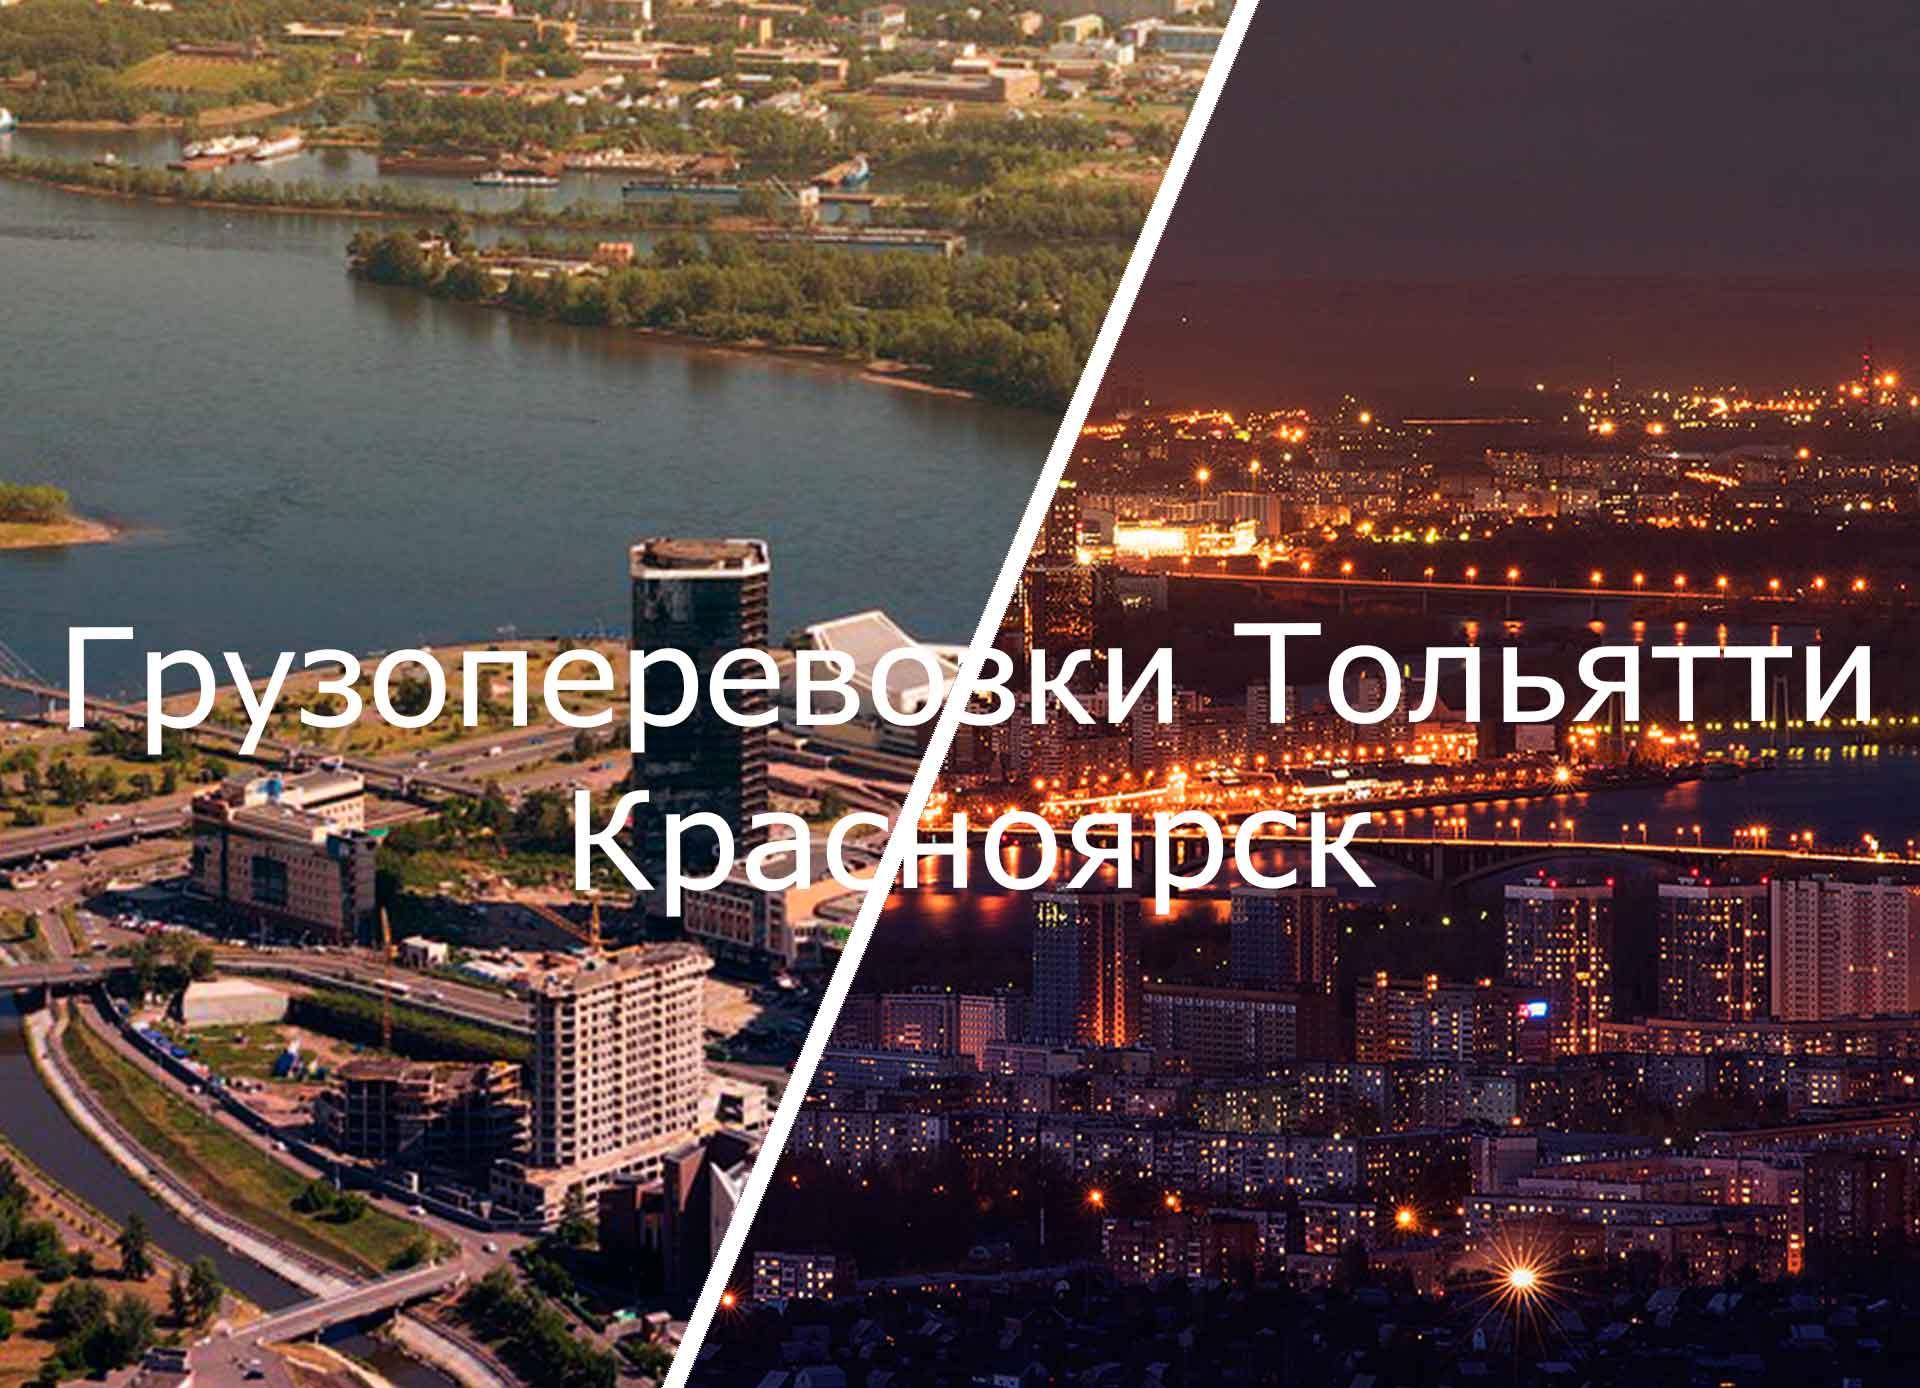 грузоперевозки тольятти красноярск